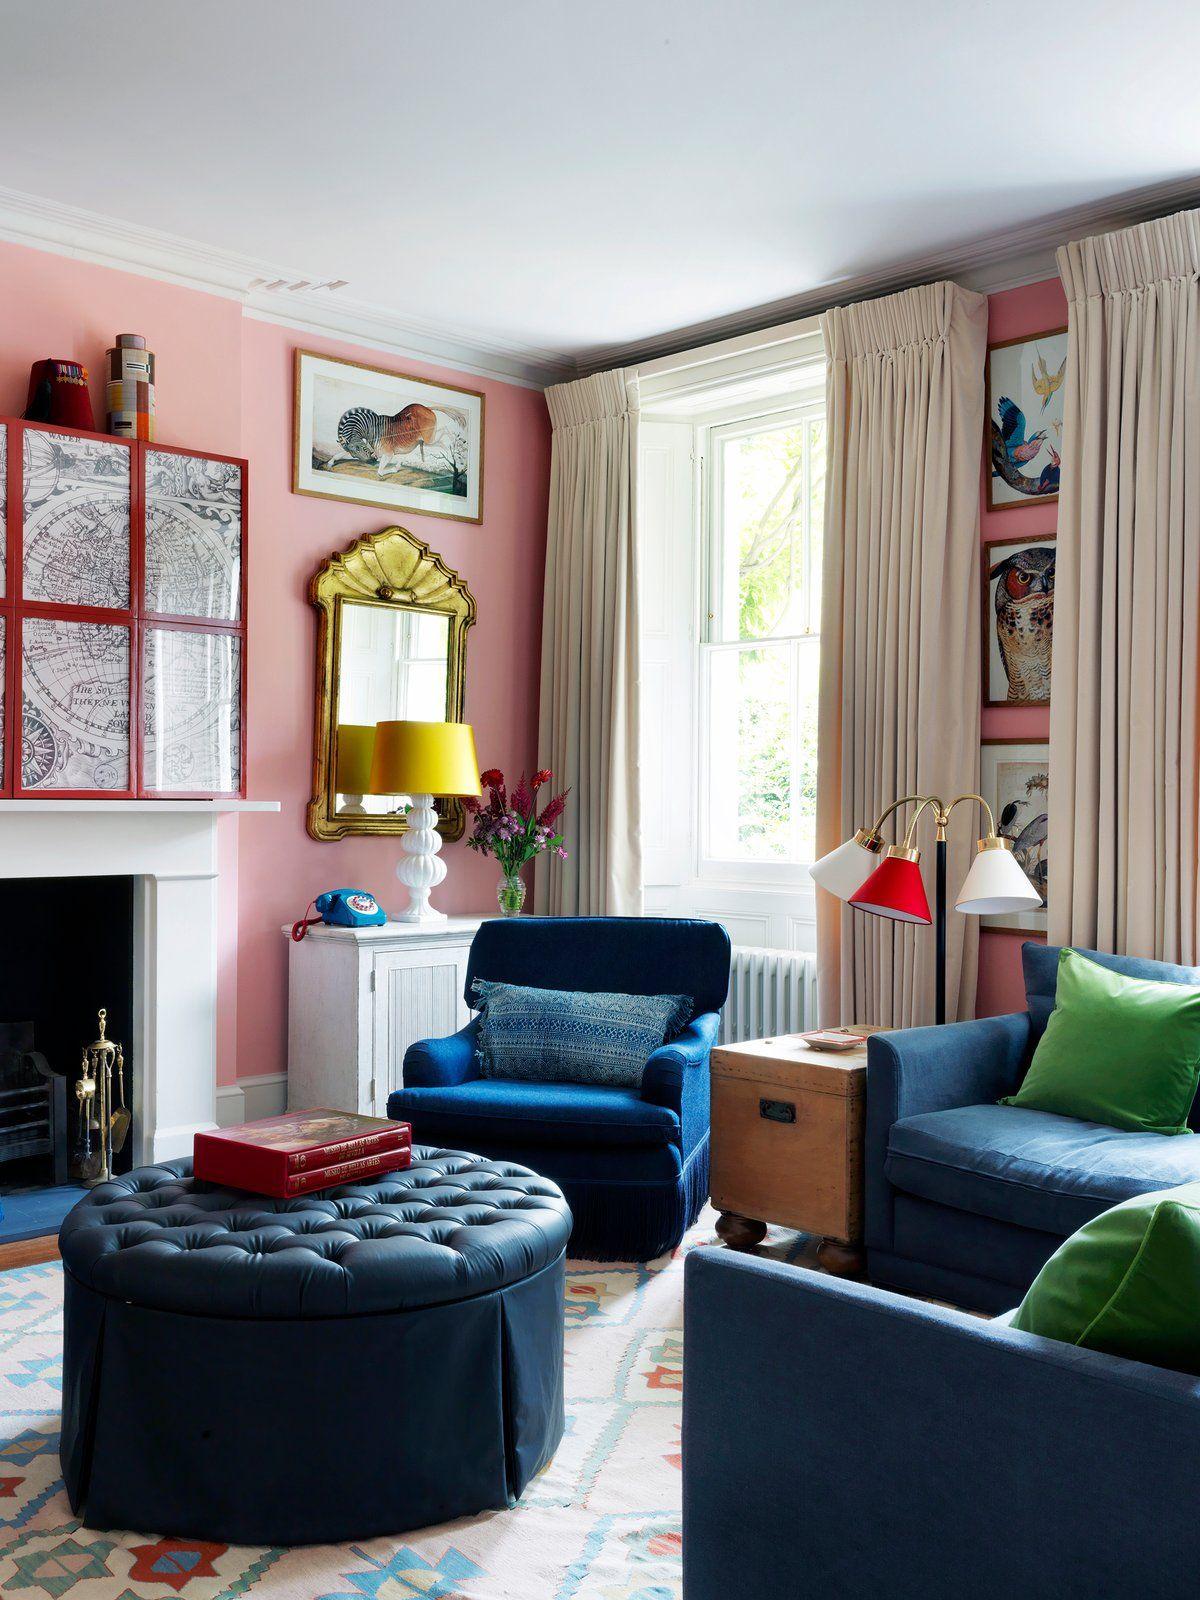 A West London House By Beata Heuman Ltd